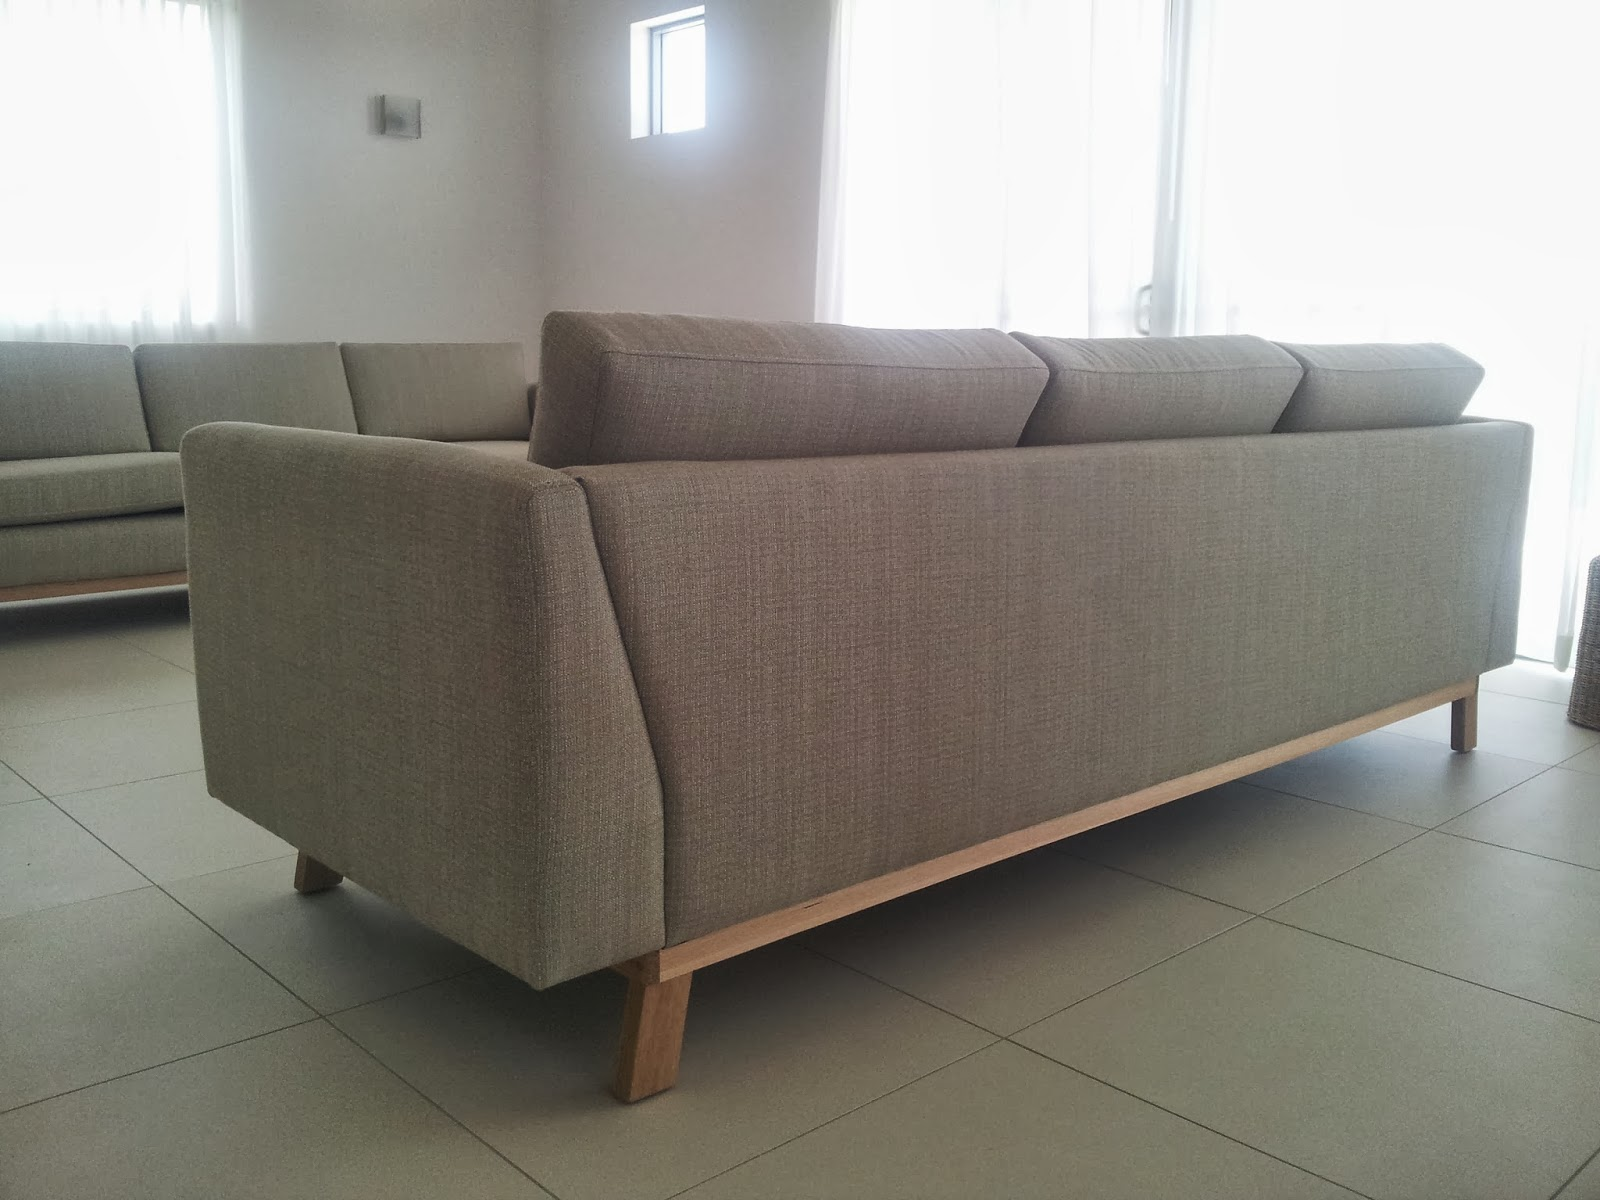 Single Sofa Bed Gold Coast Beds On Gumtree Australian Made Sofas Brokeasshome